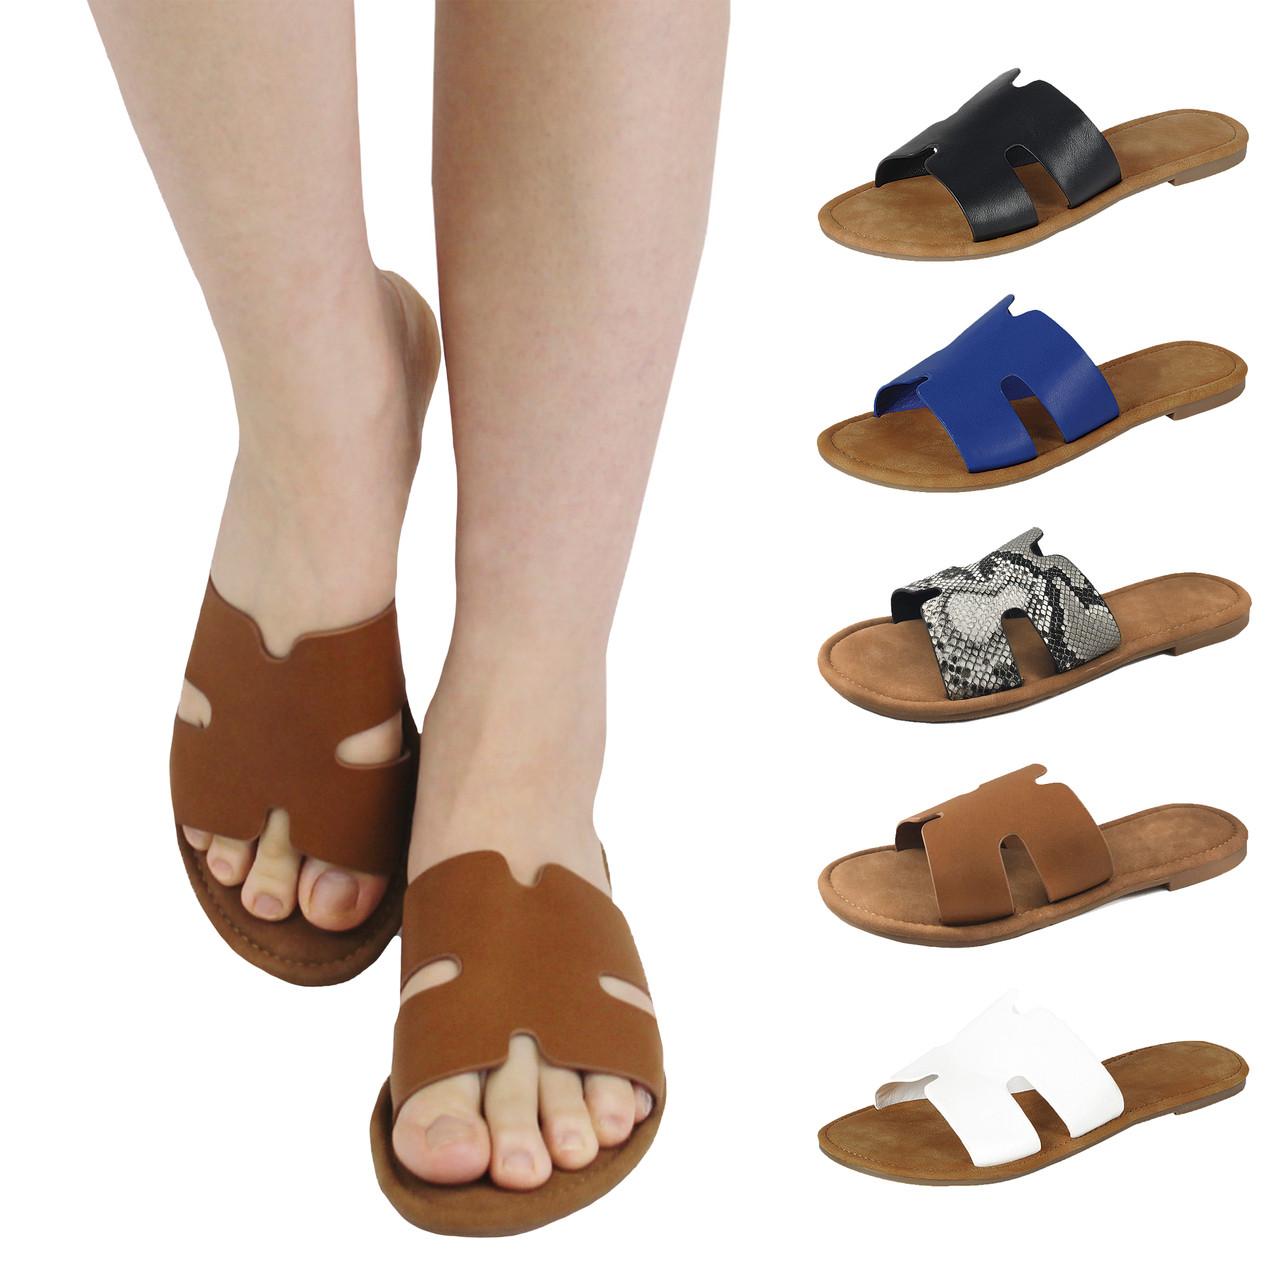 d1ebdb8c69 Women's H Greece Open Toe Flat Slide Sandal (Free Shipping)